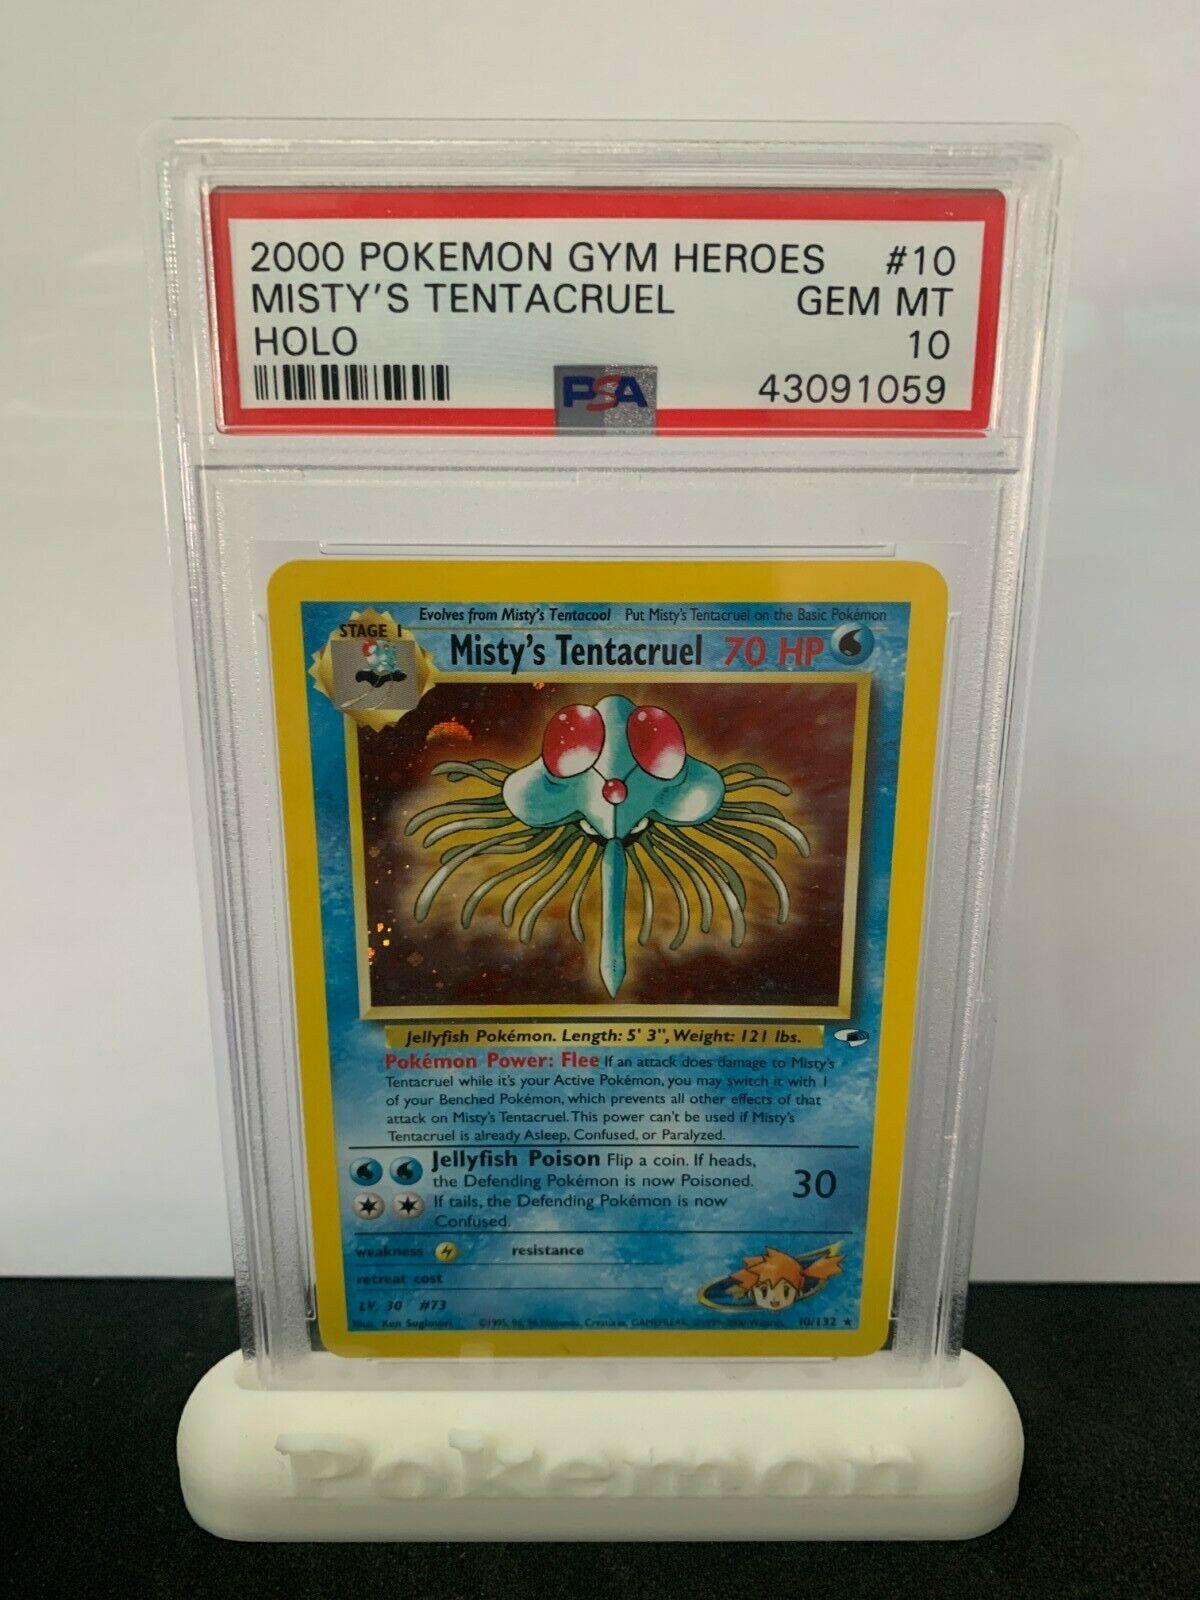 Pokemon PSA 10 Gym Heroes Mistys Tentacruel Holo Rare Mint 10